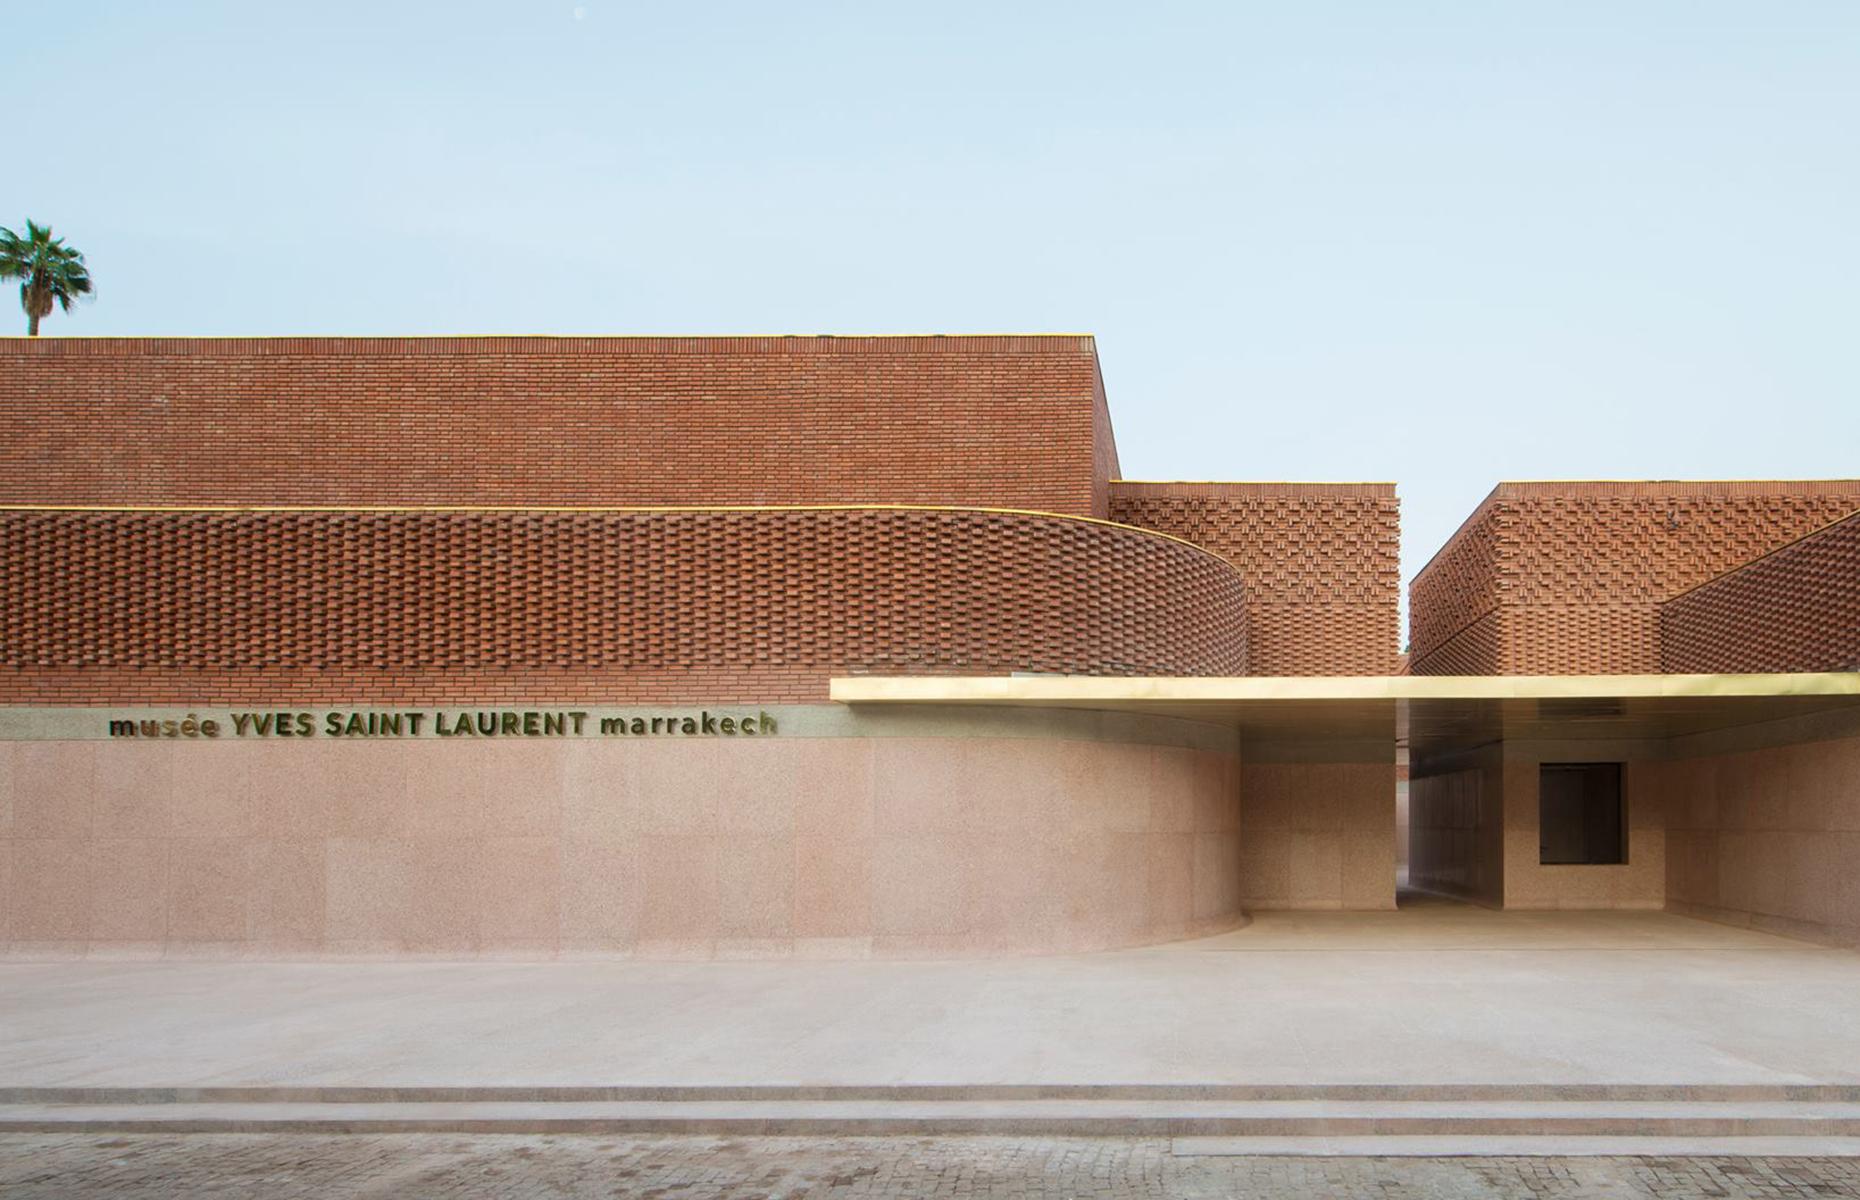 Musée Yves Saint Laurent in Marrakech (Image: Musée Yves Saint Laurent Marrakech/Facebook)